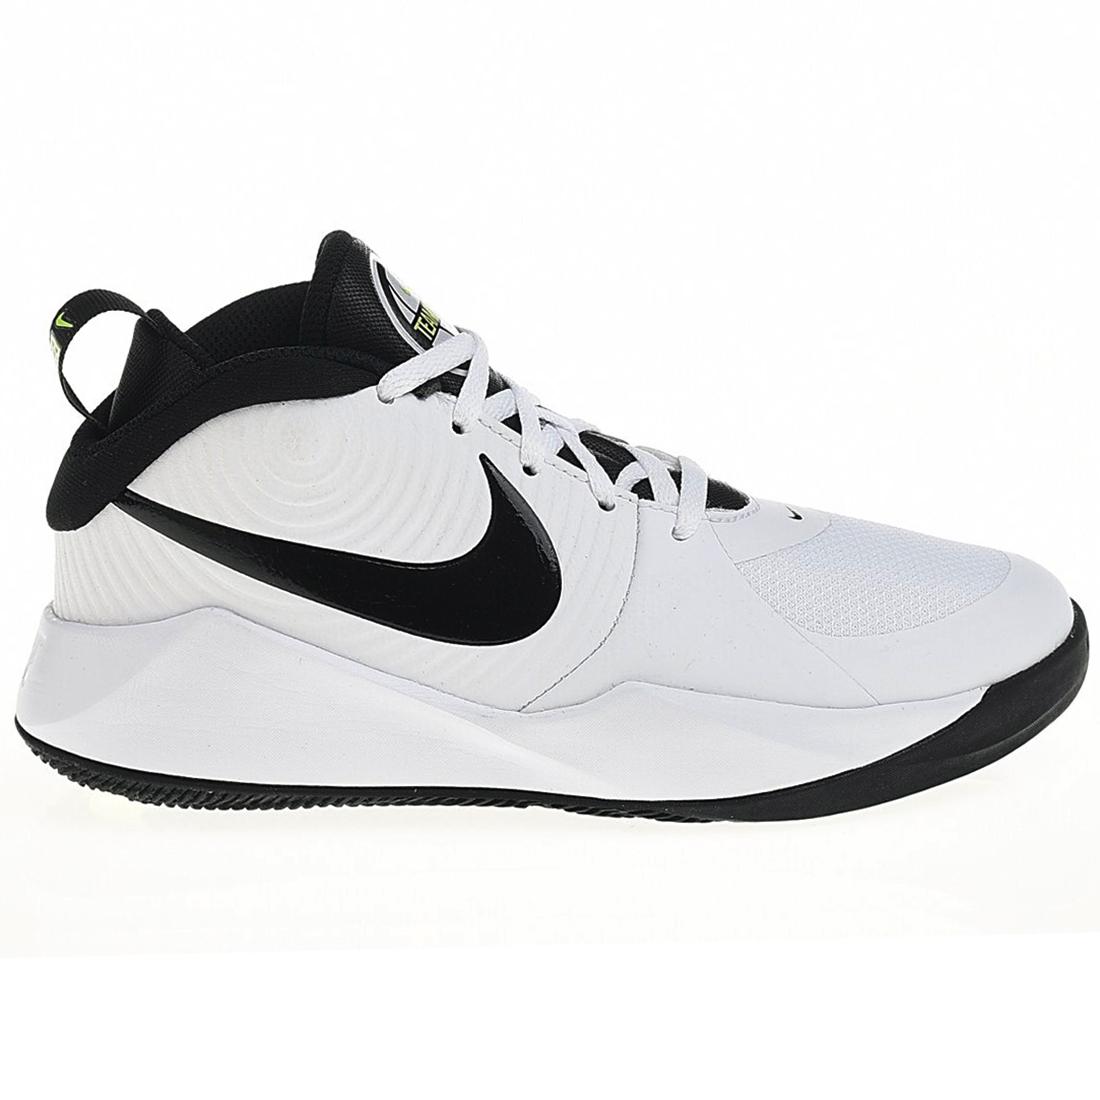 Nike Team Hustle 9 GS Basketball Sneaker weiß schwarz